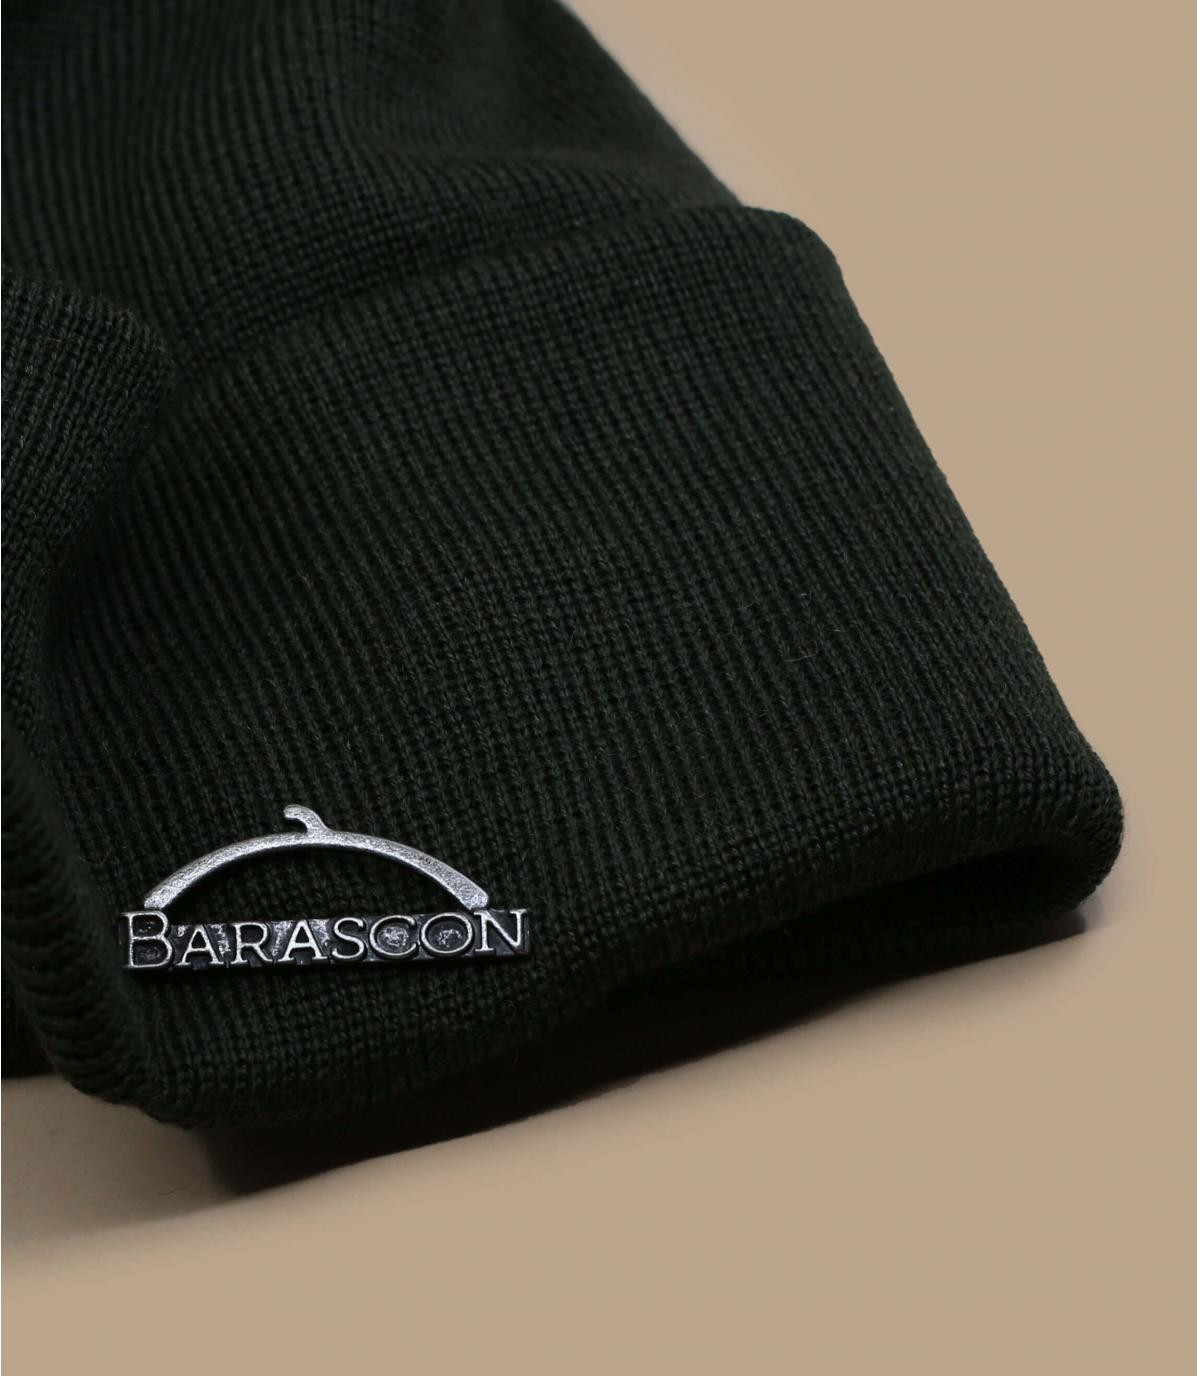 Details Barascon Beanie Wool Acryl green - afbeeling 2